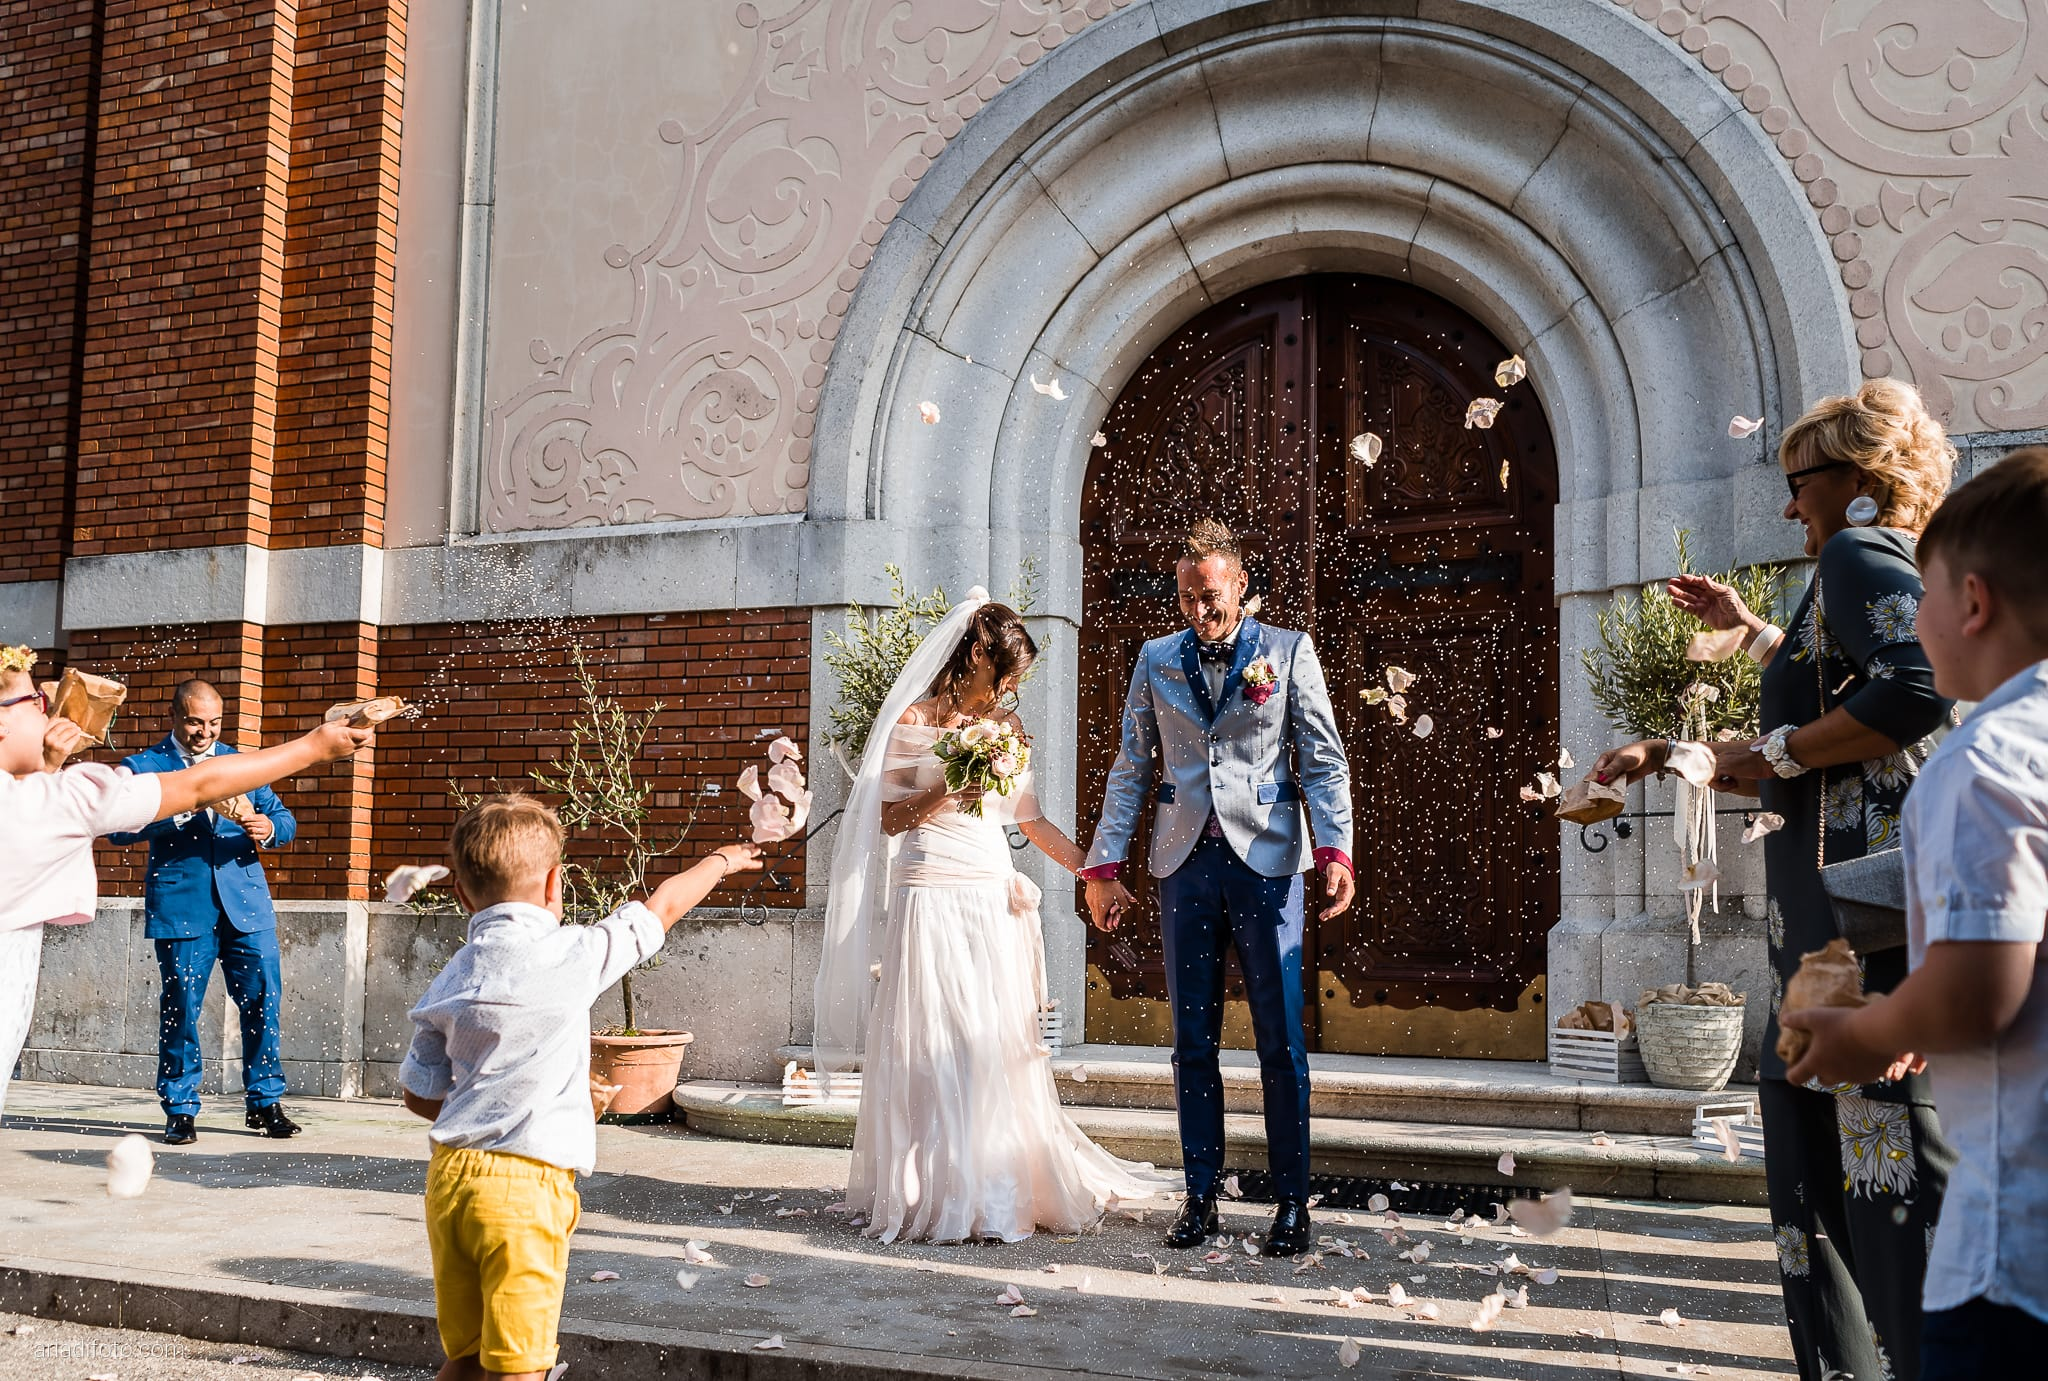 Stefania Raffaele Matrimonio Country Chic Outdoor Gorizia cerimonia lancio del riso